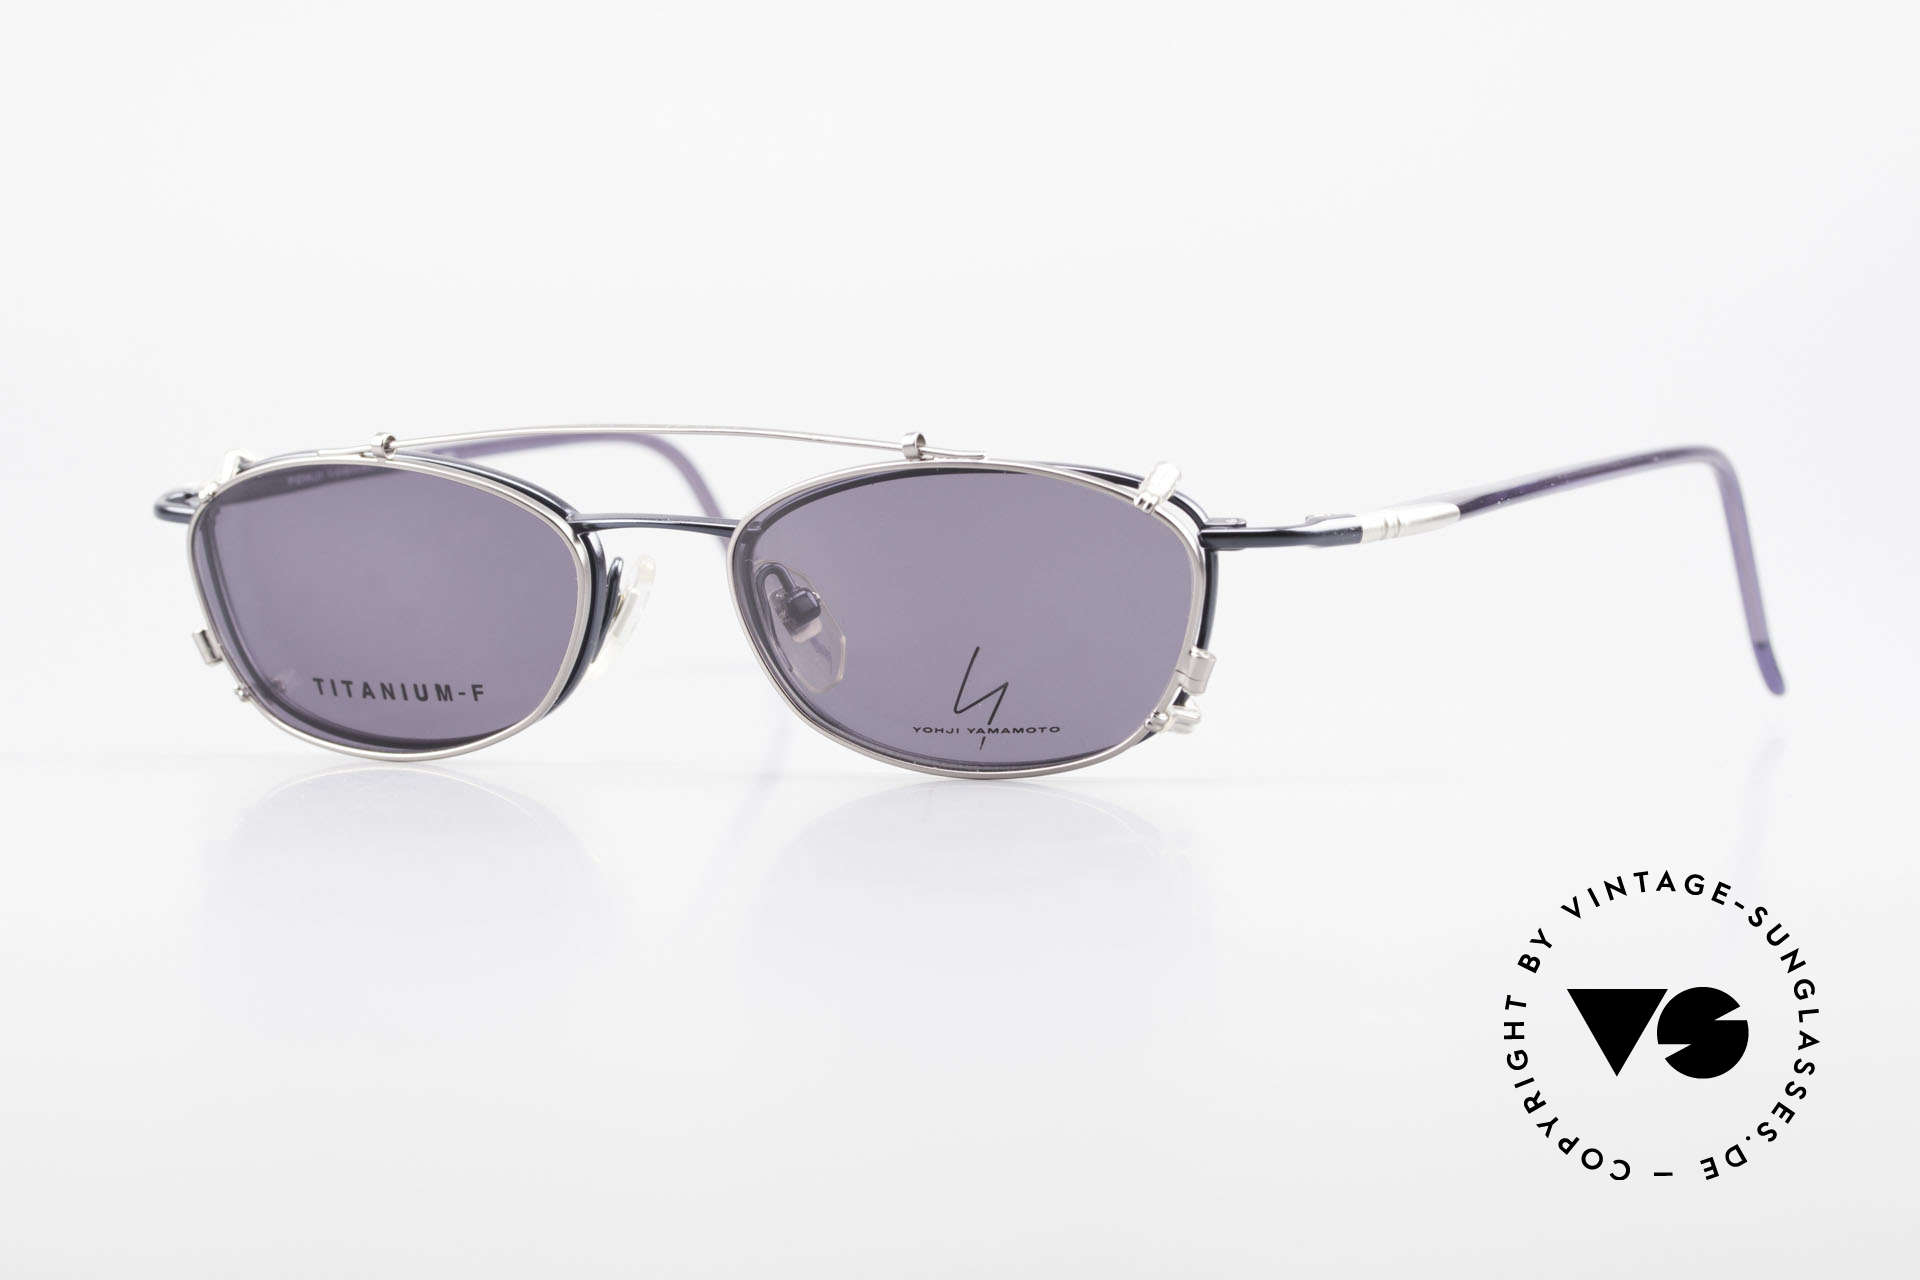 Yohji Yamamoto 51-0013 Clip On Titanium Frame Blue, vintage eyeglasses by Yohji Yamamoto with Clip-On, Made for Men and Women